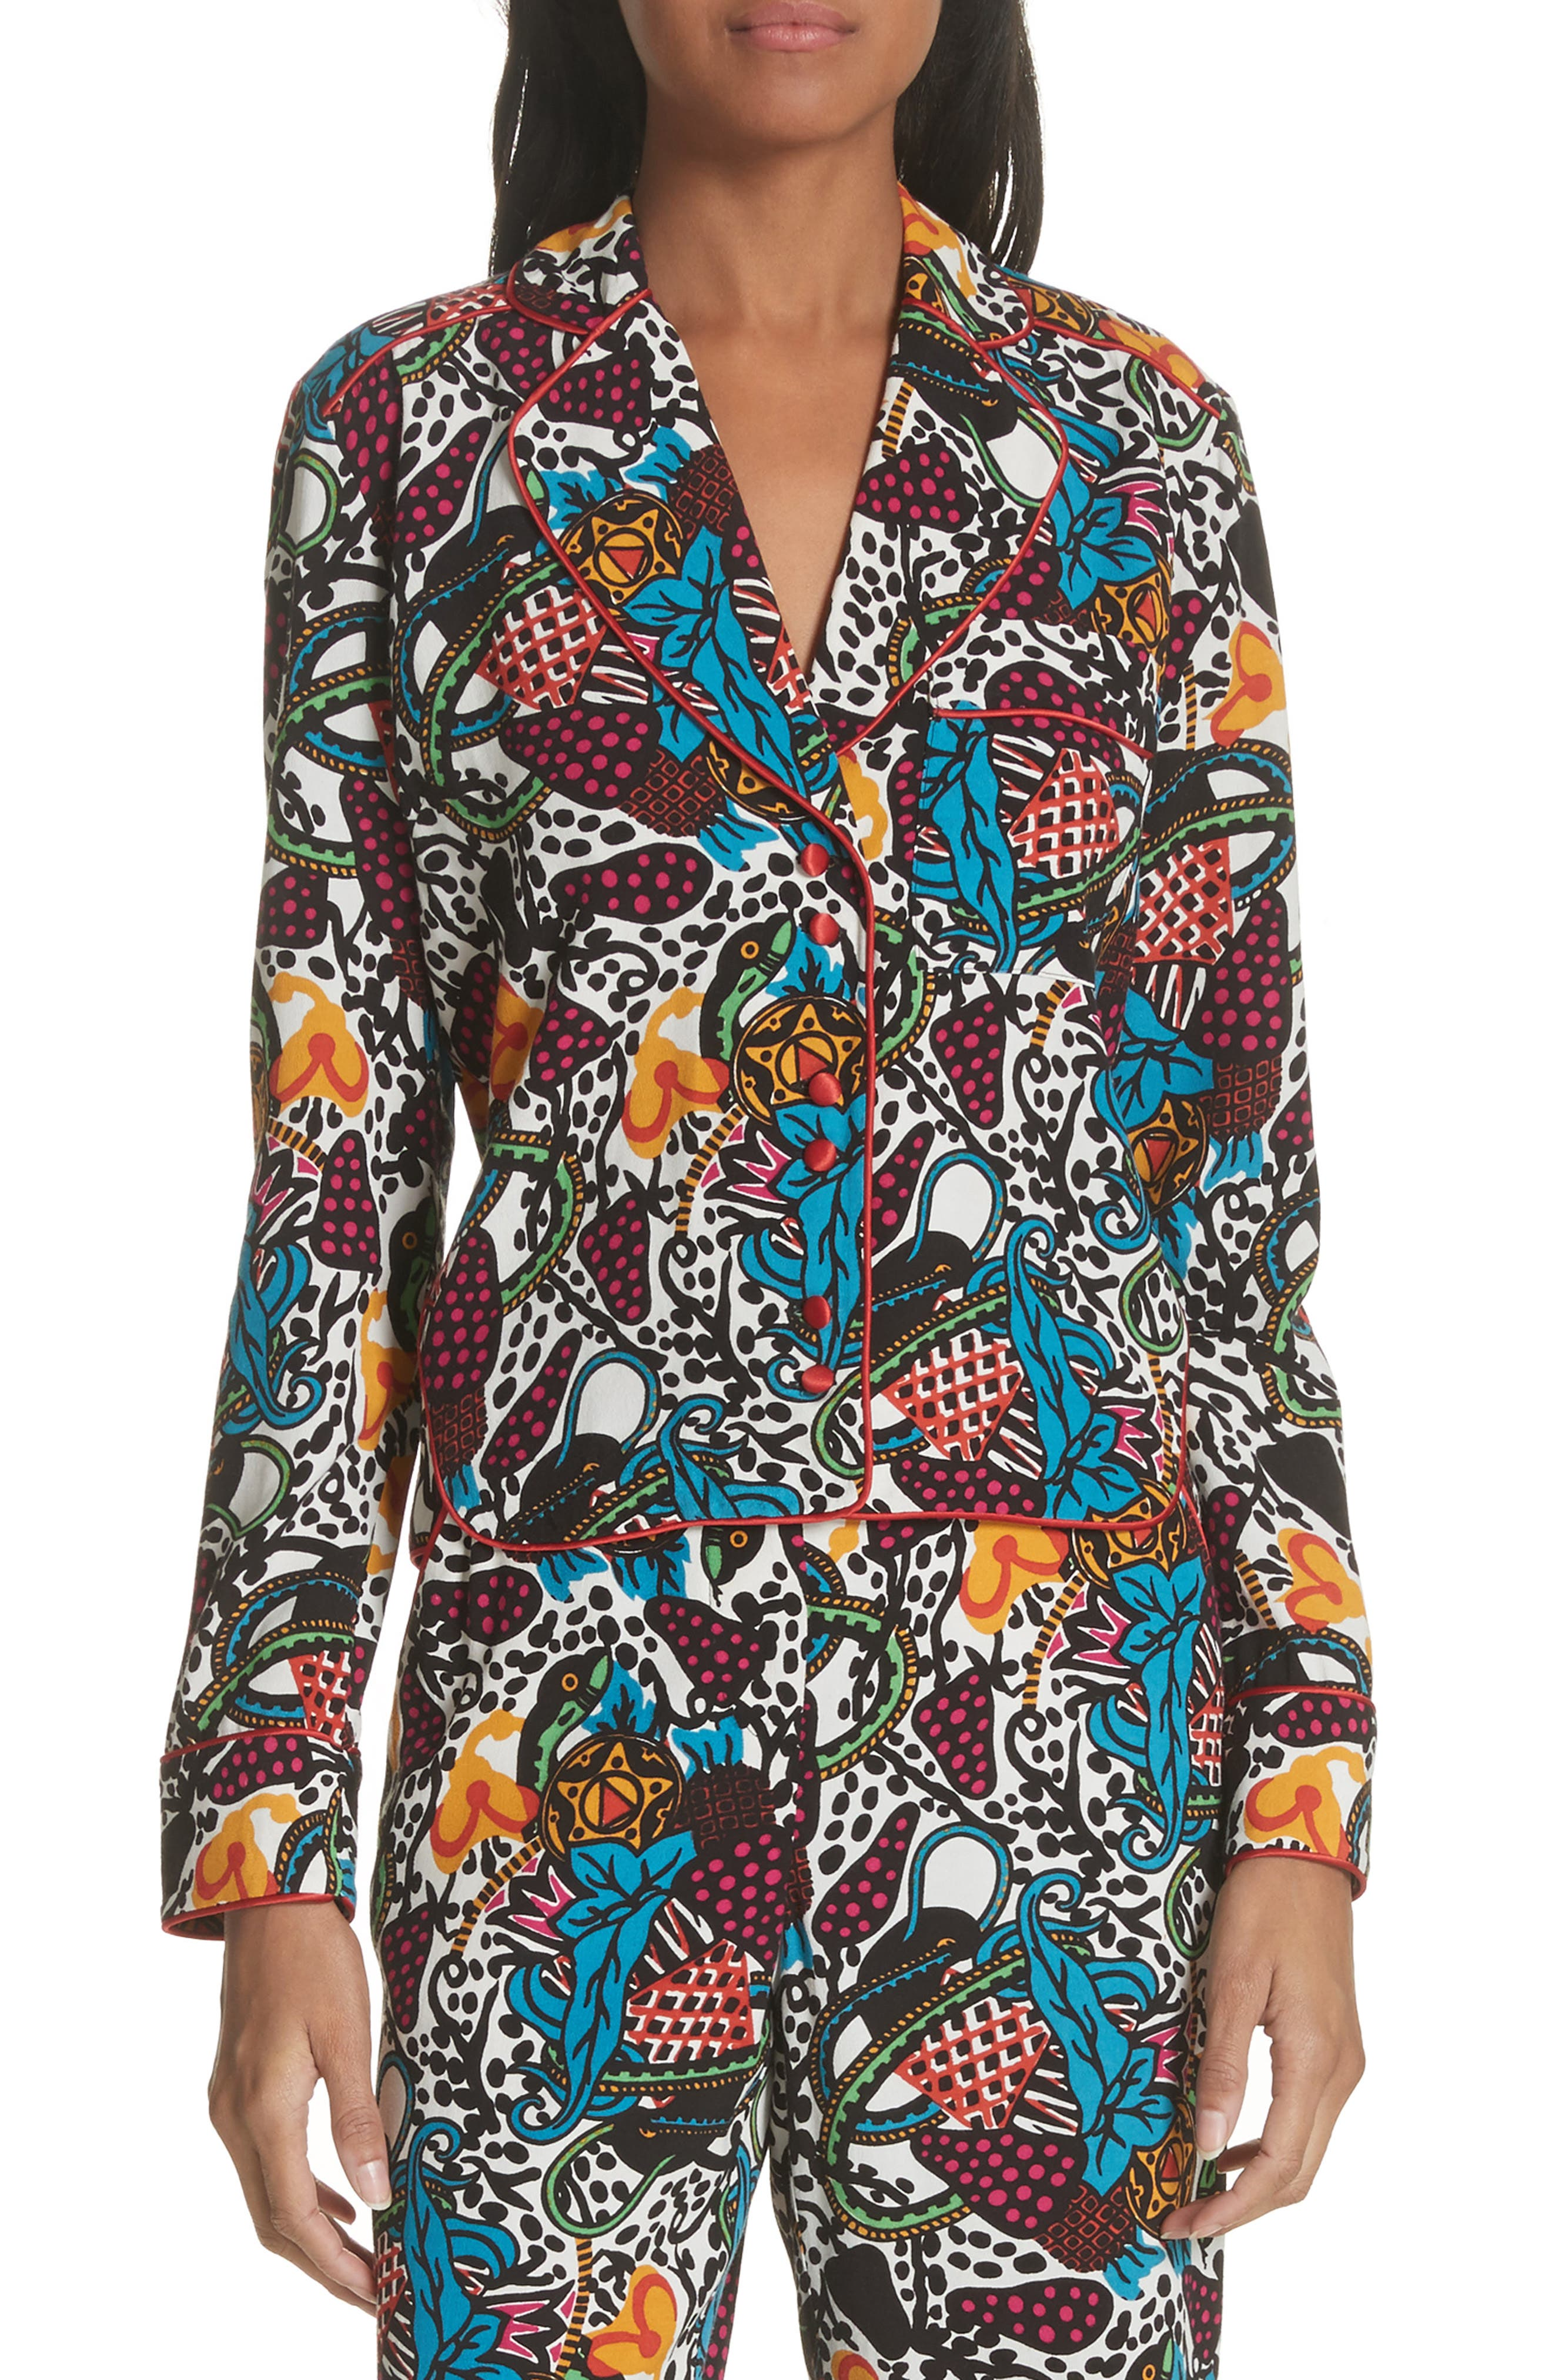 Penelope Pajama Shirt,                             Main thumbnail 1, color,                             Off White/ Blue/ Green/ Yellow